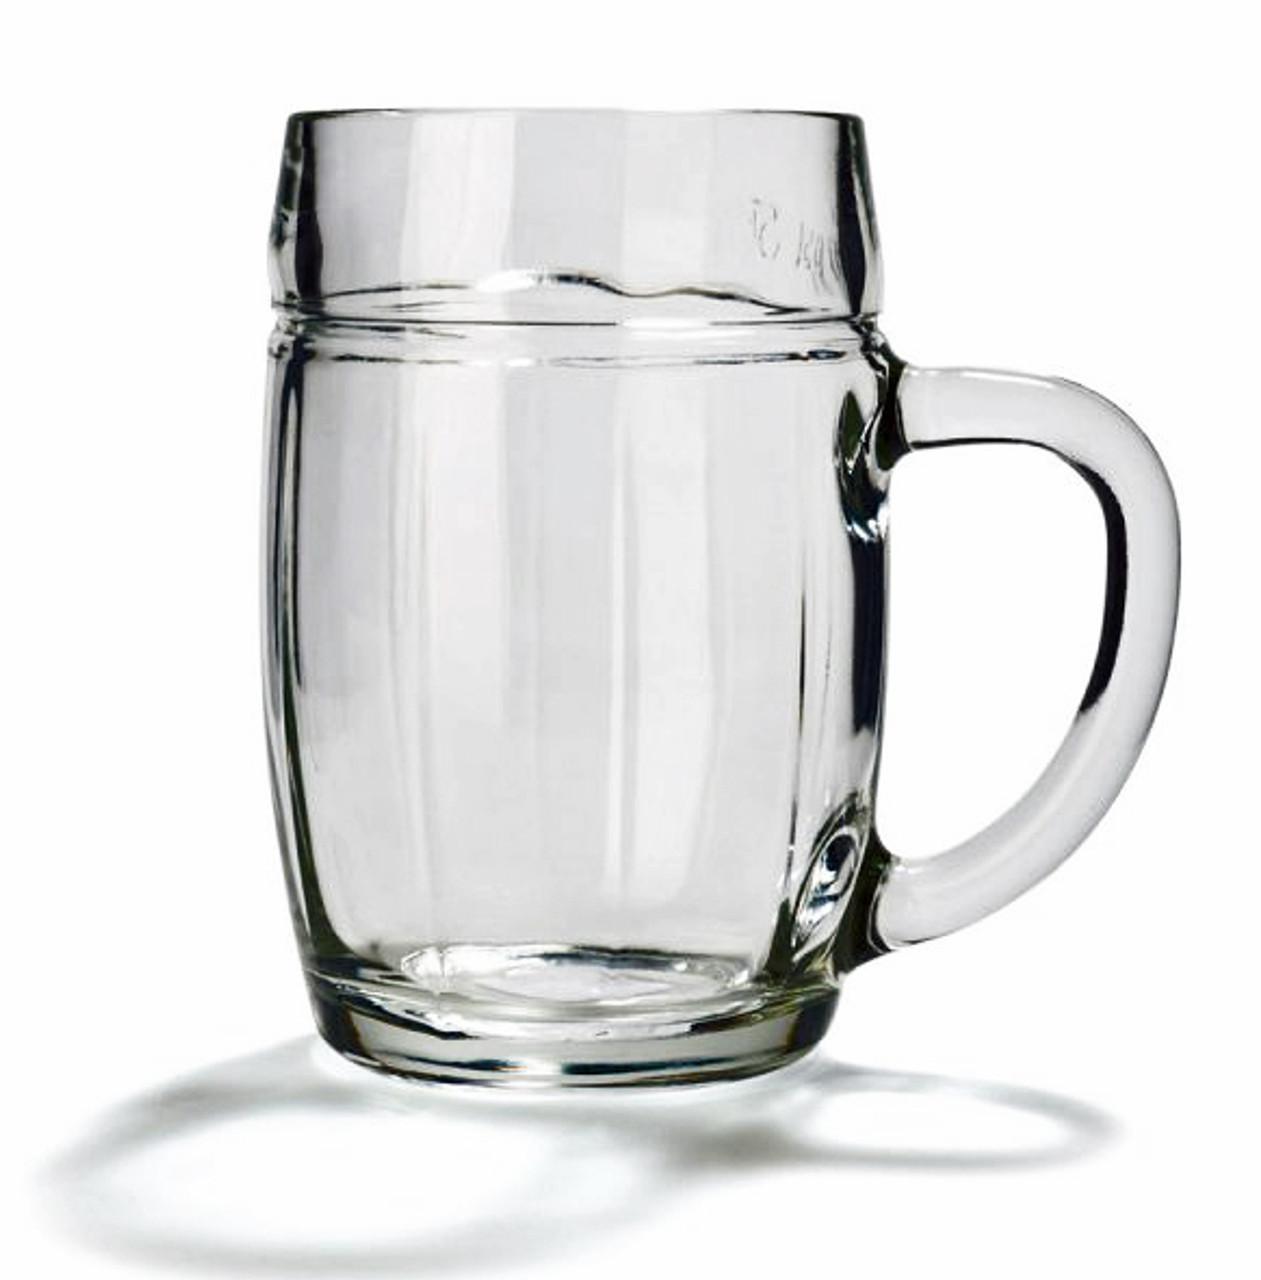 Barrel Shaped glass Beer Mug